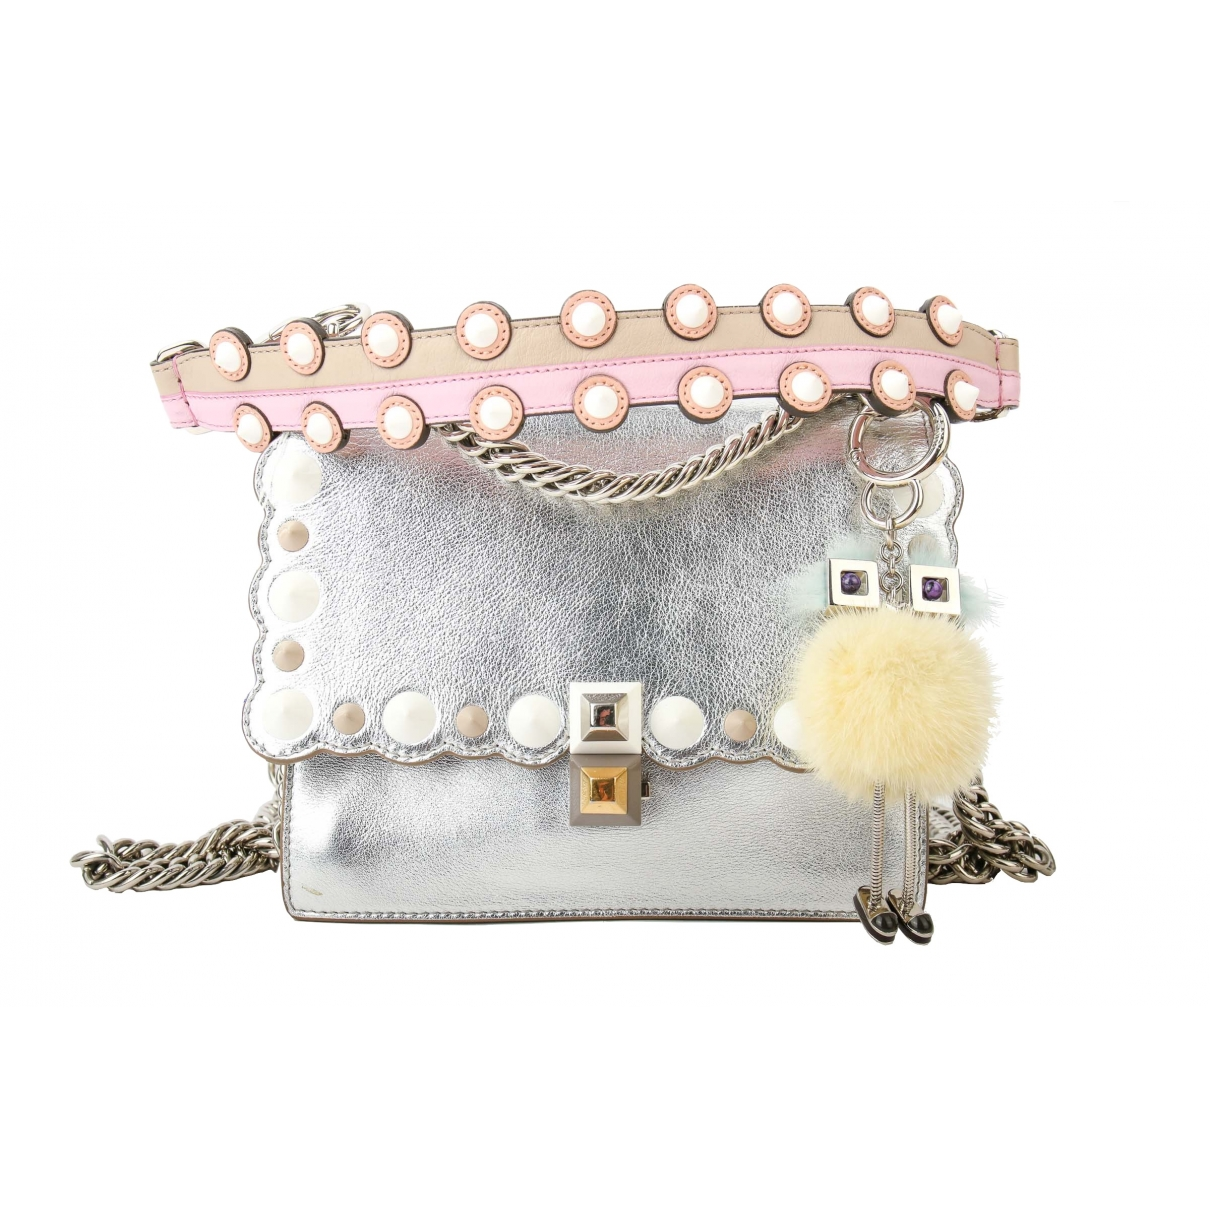 Fendi Kan I Handtasche in  Metallic Leder